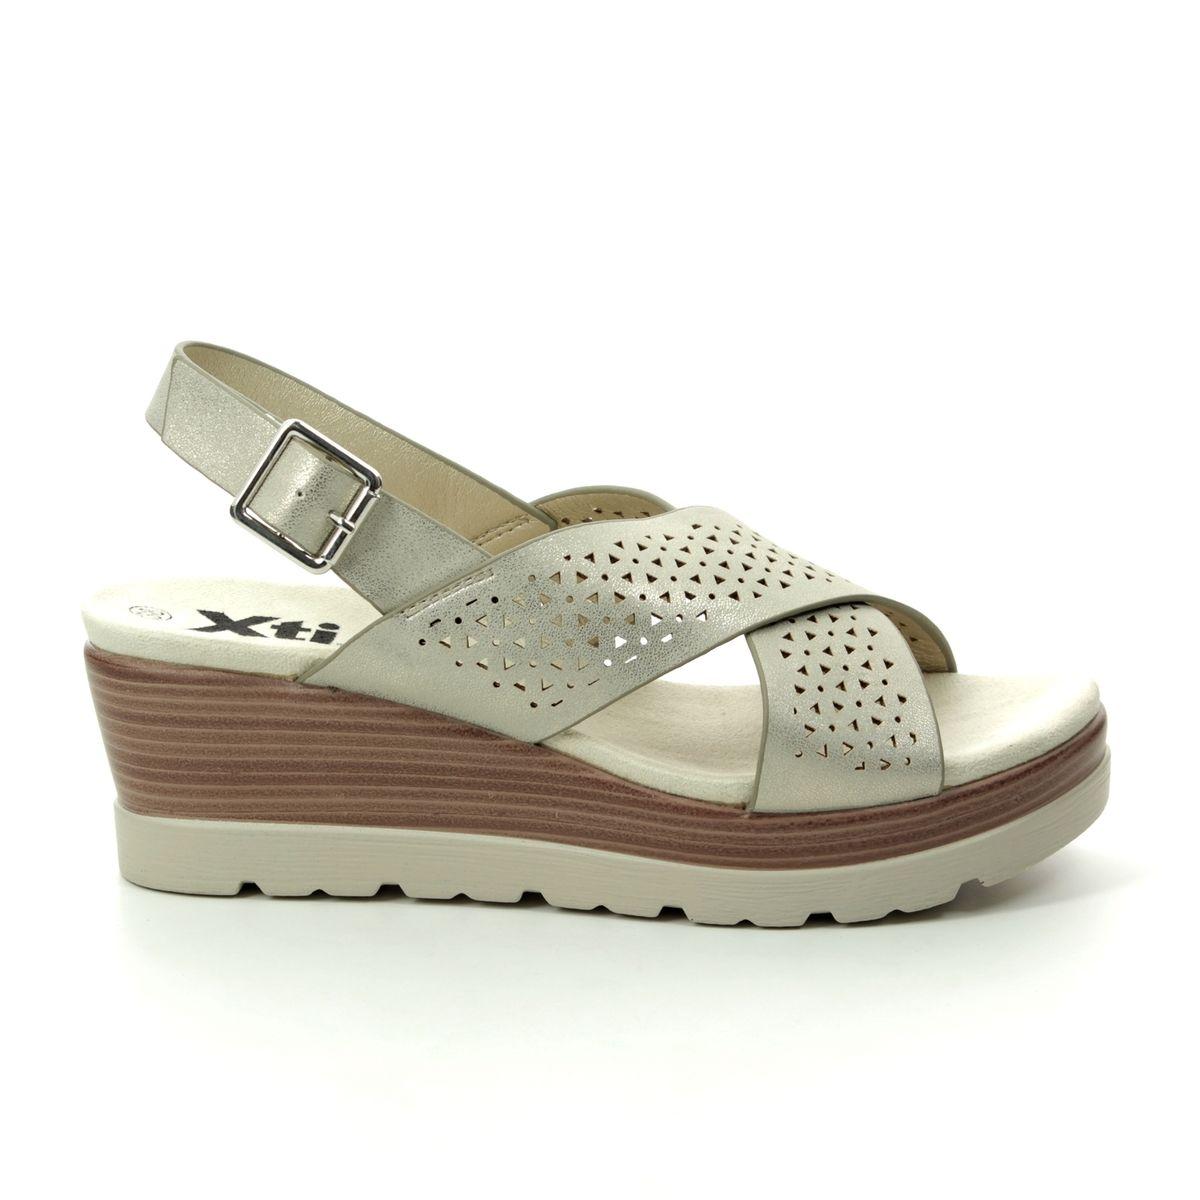 6c604183ea6 XTI Wedge Sandals - Gold - 04886202 MARITSA